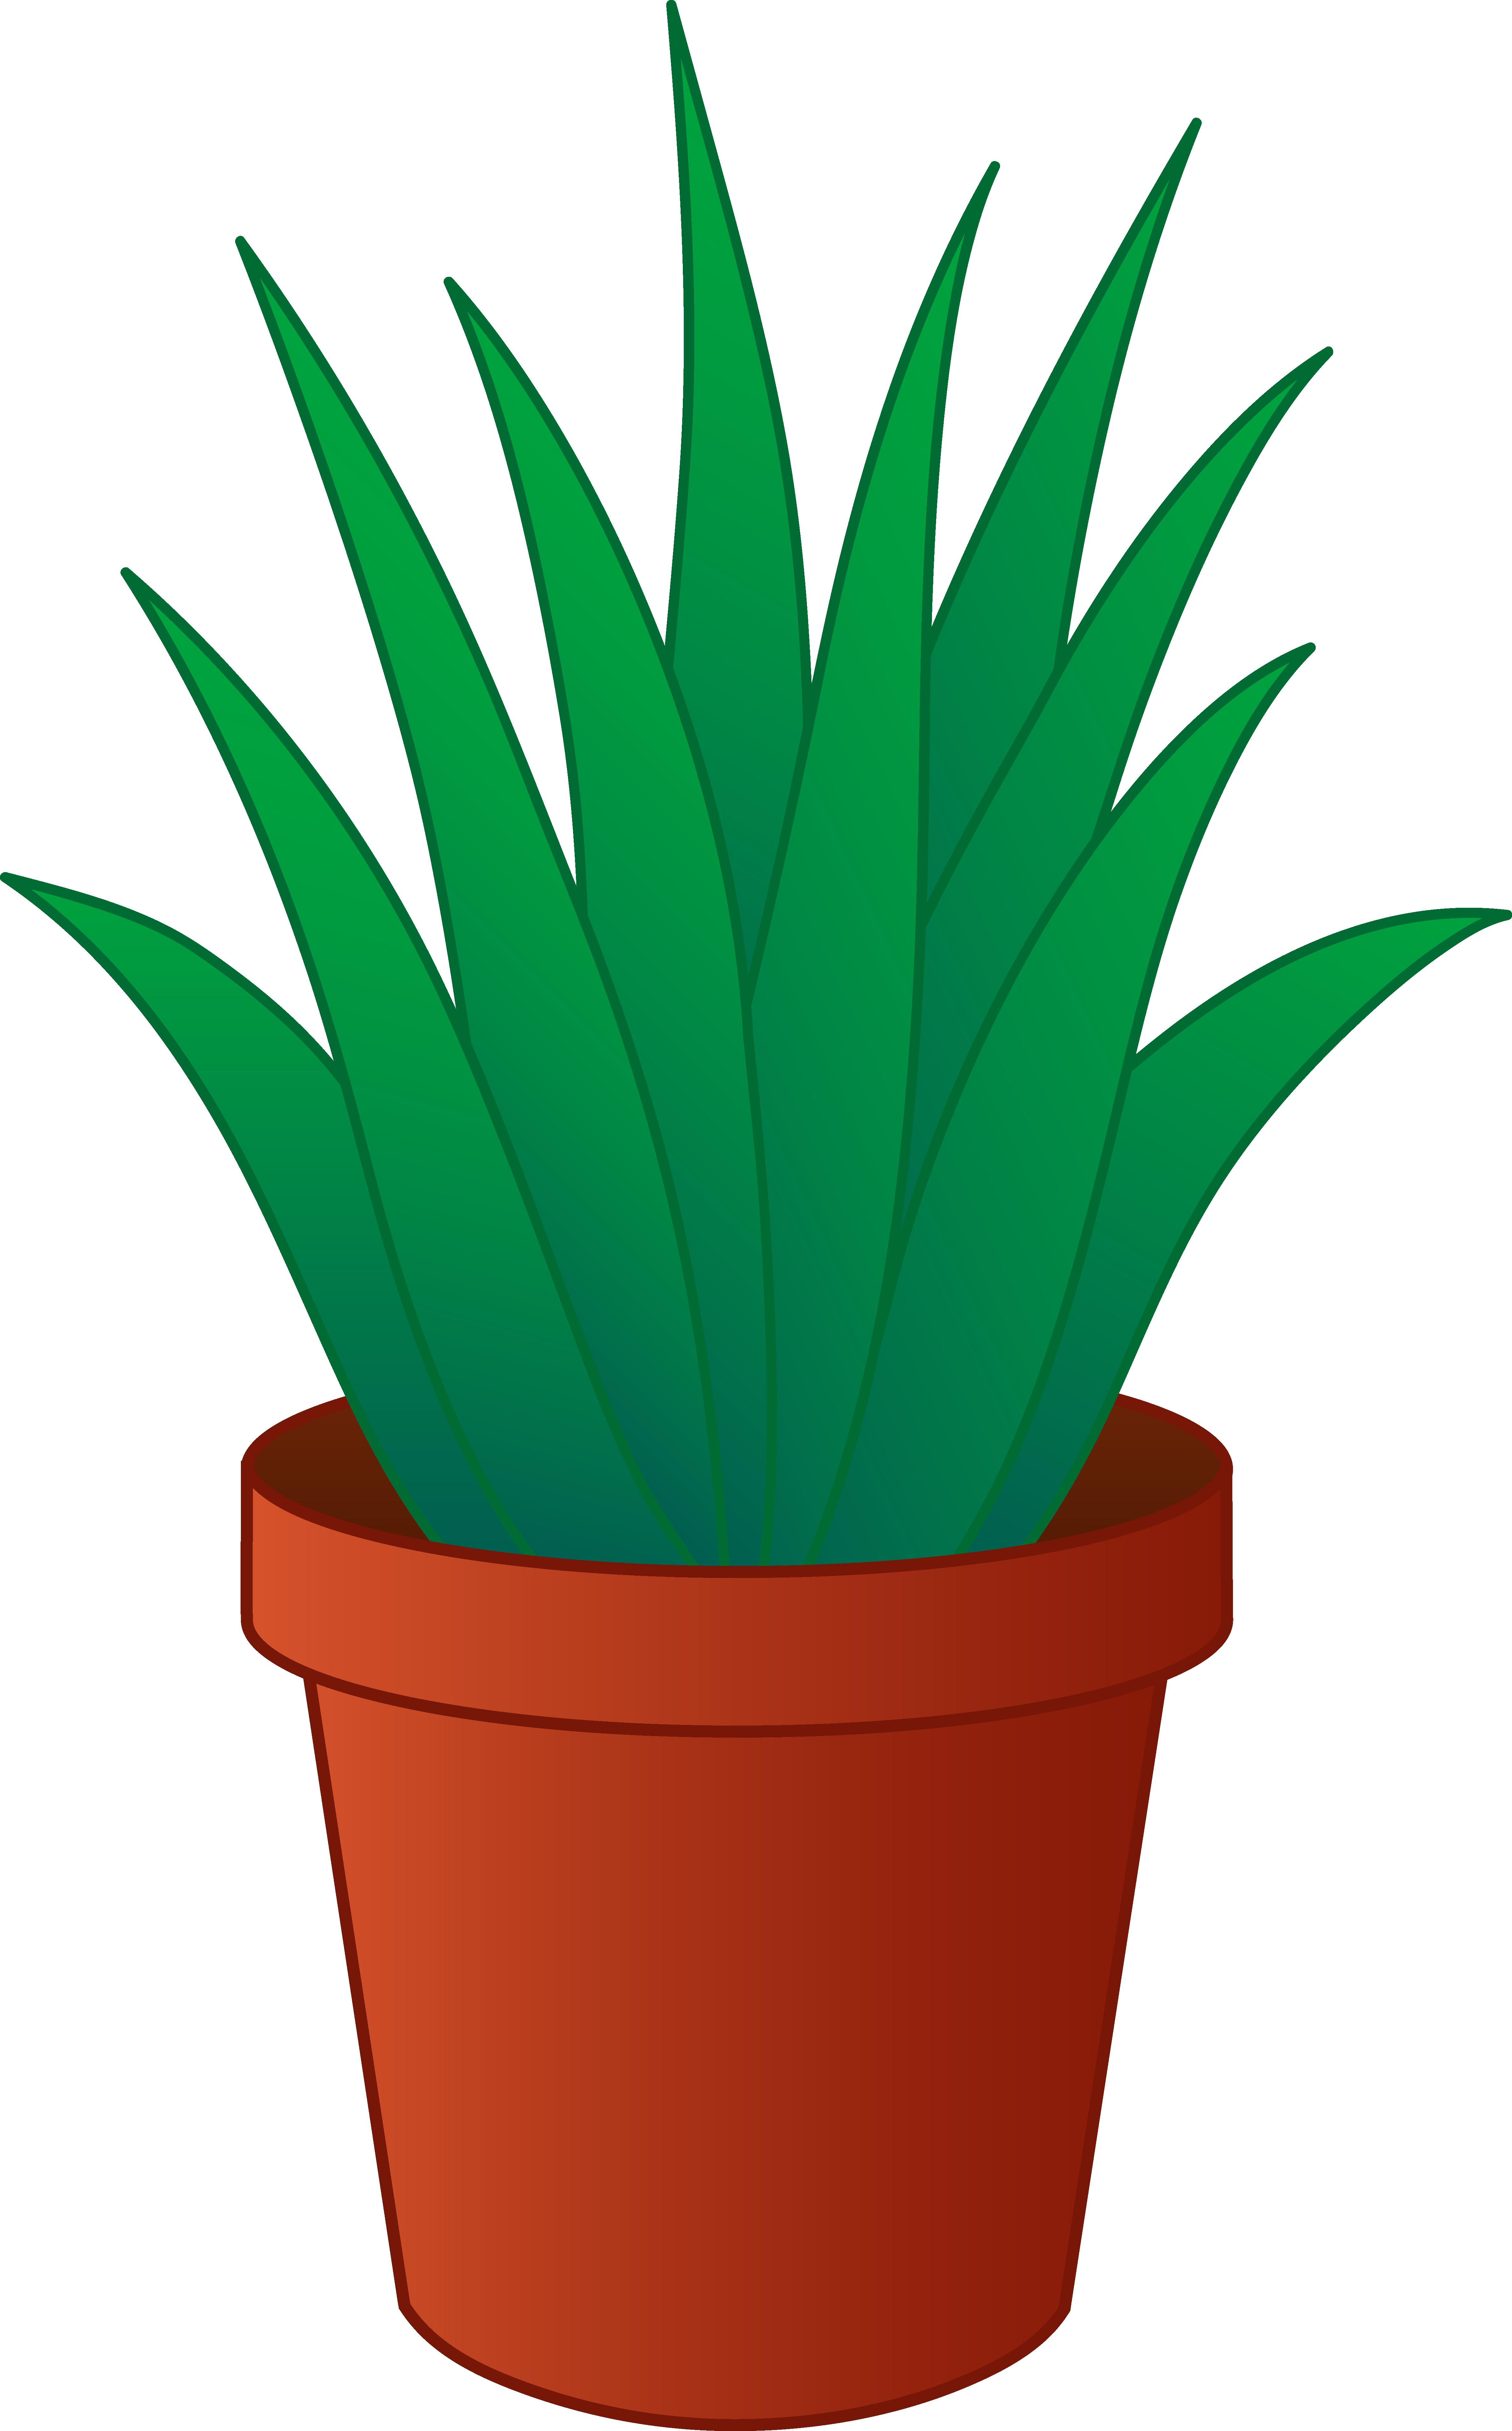 Drawn pot plant animated Clipart clipart Free Panda Clipart